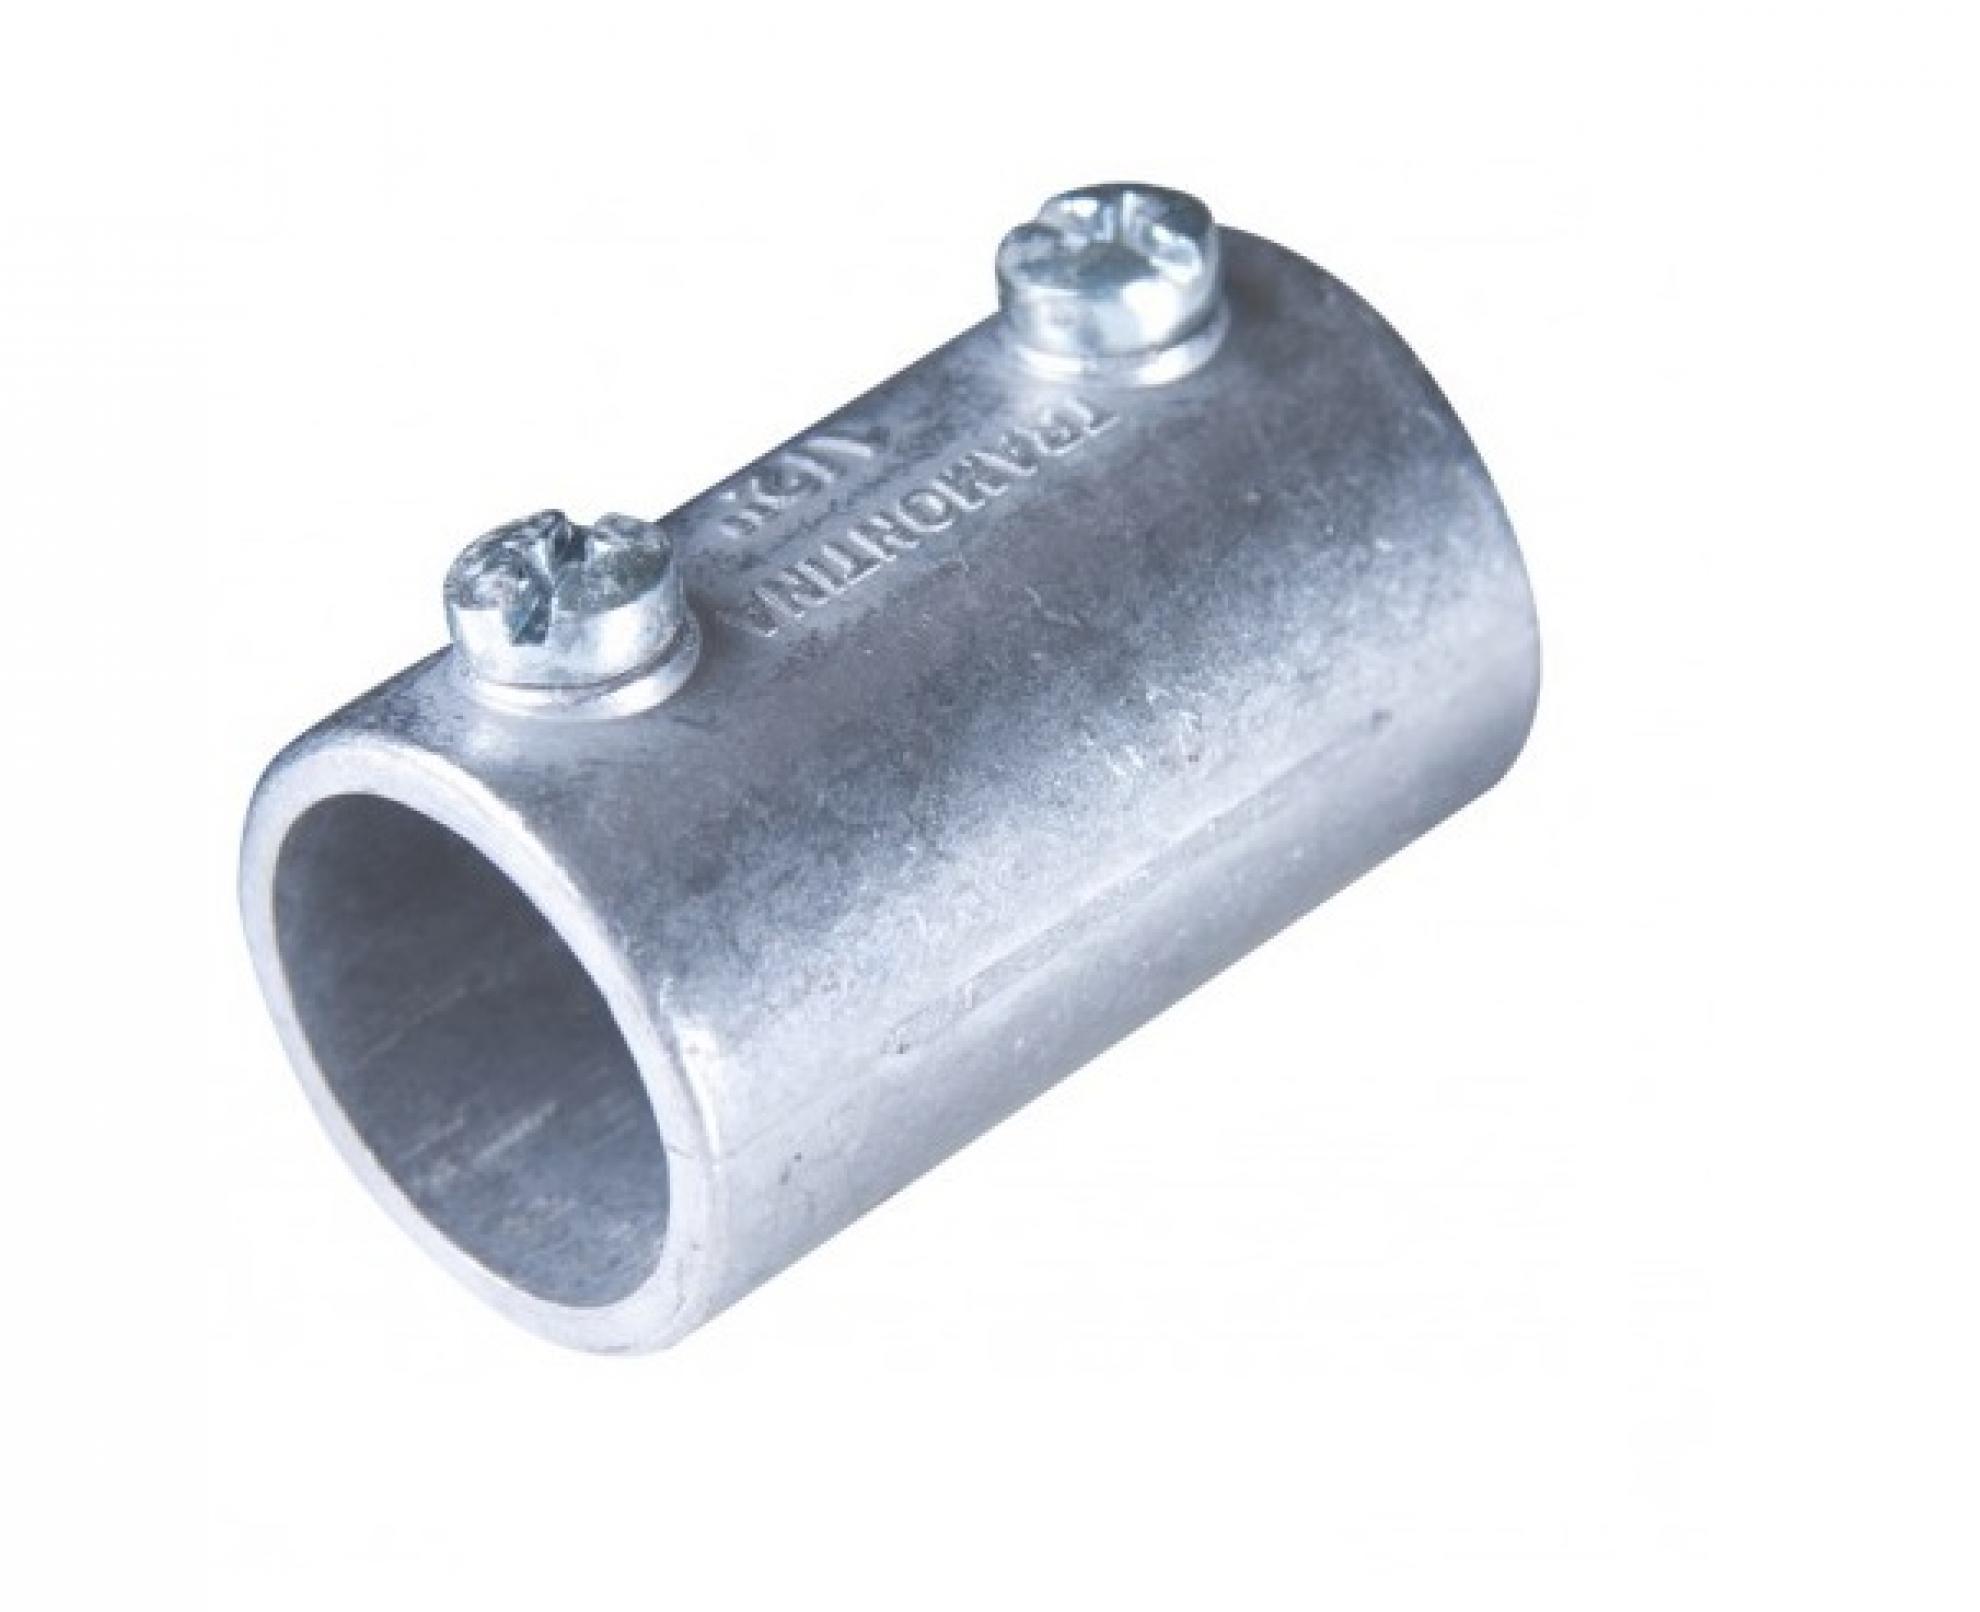 Luva de emenda Lisa 1/2 - Aluminio